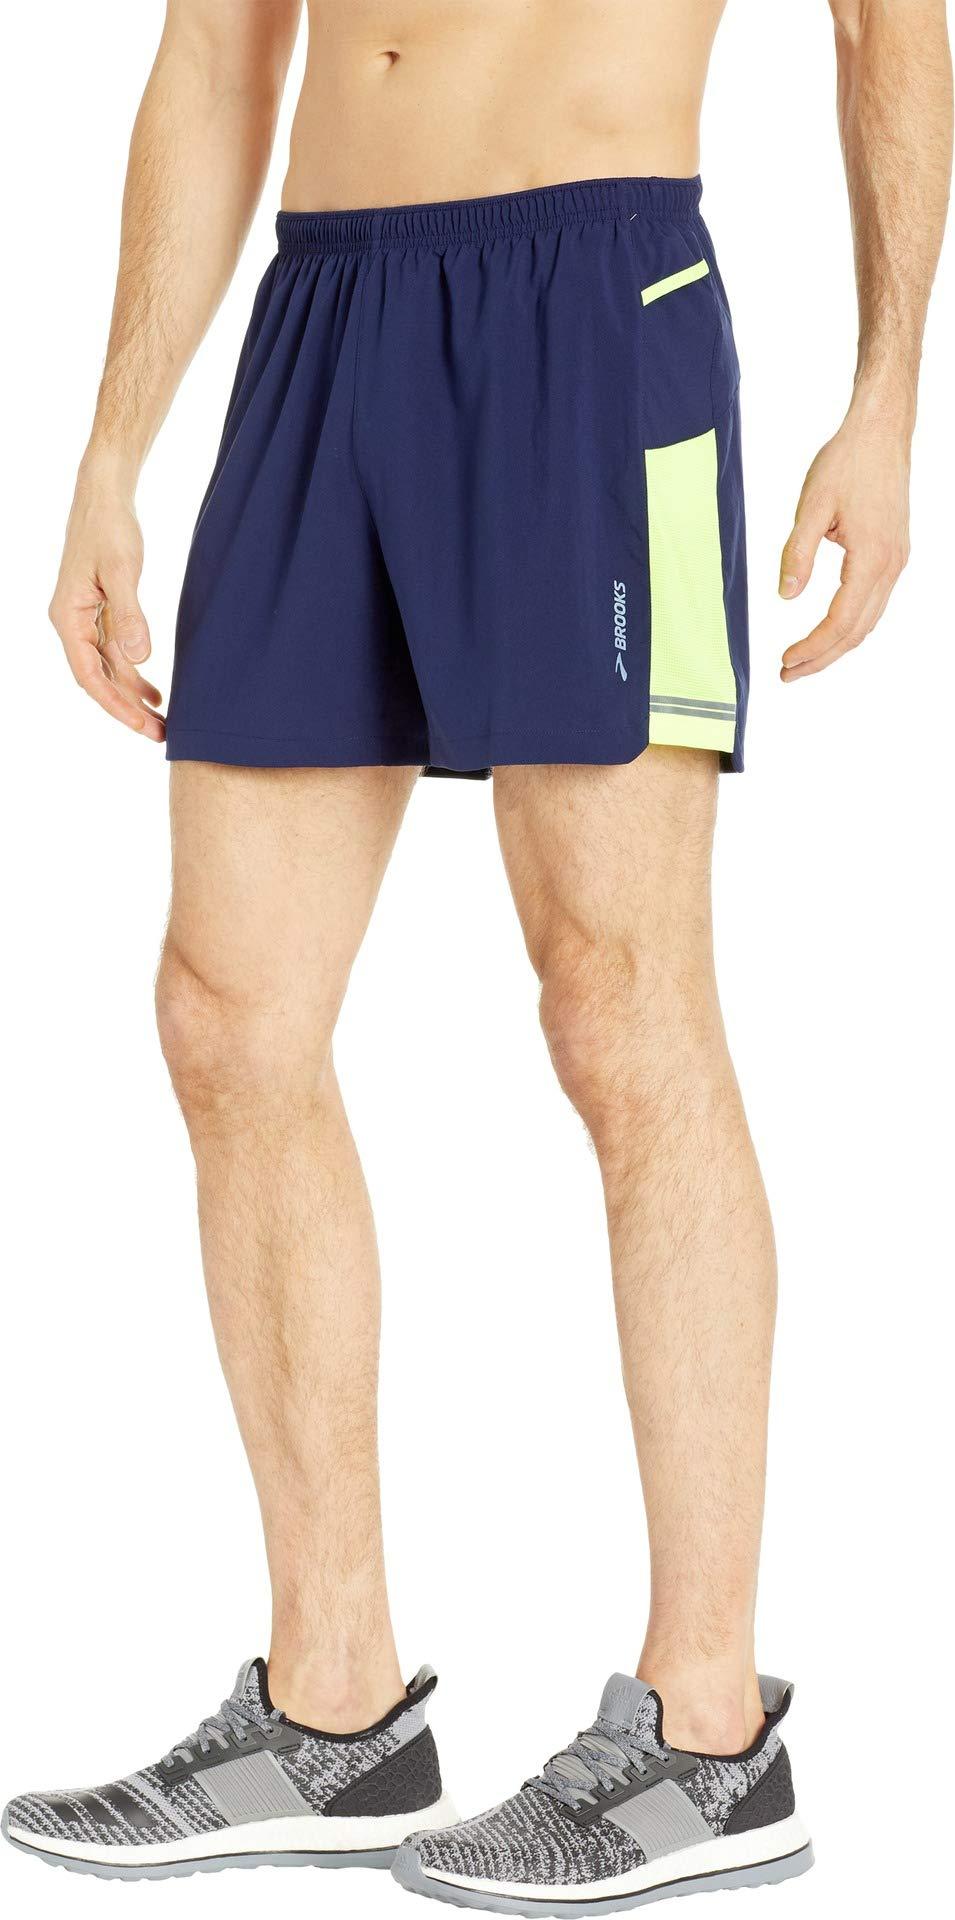 Brooks Men's Sherpa 5'' Shorts Navy/Nightlife Medium 5 by Brooks (Image #2)